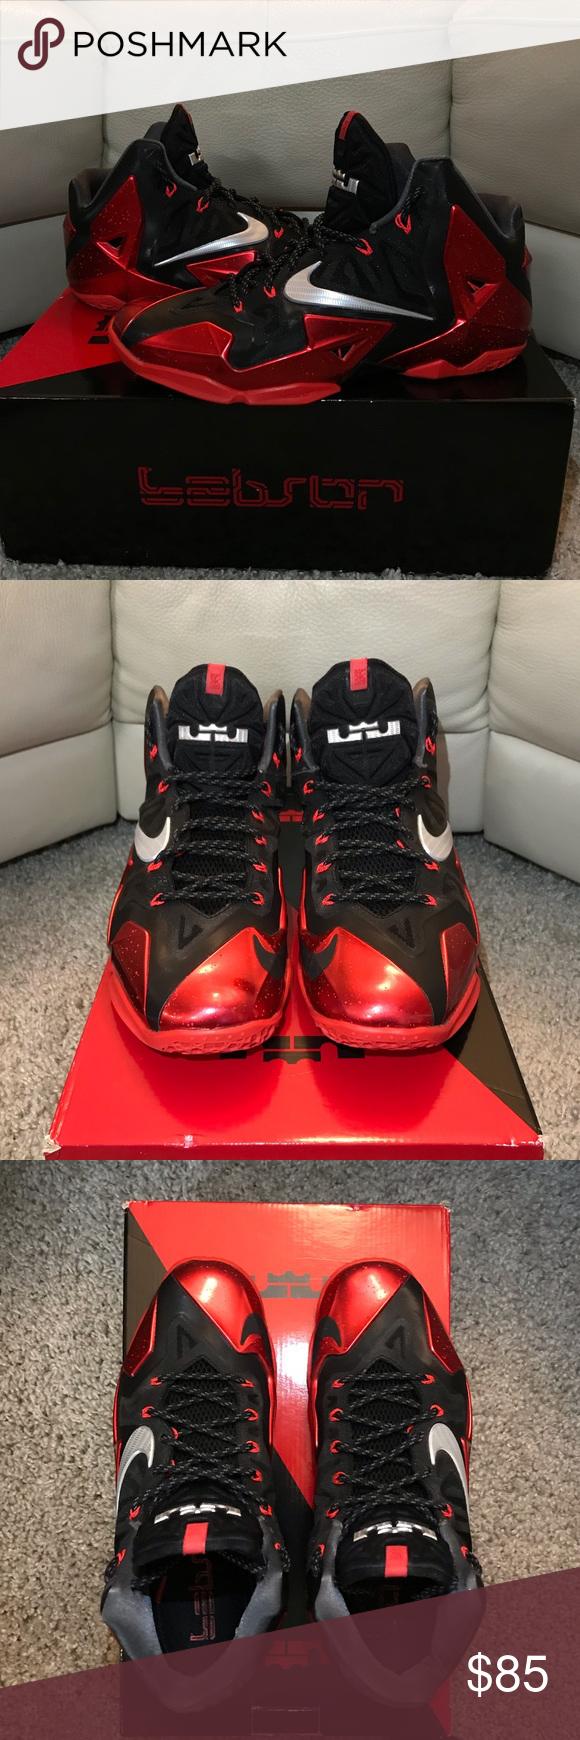 "finest selection d1287 433b0 Nike Lebron XI Miami Heat ""Away"" Nike LeBron 11 ""Away"" Black Metallic Silver -University Red-Bright Crimson-Dark Grey •Size- US 10.5 •Great condition."